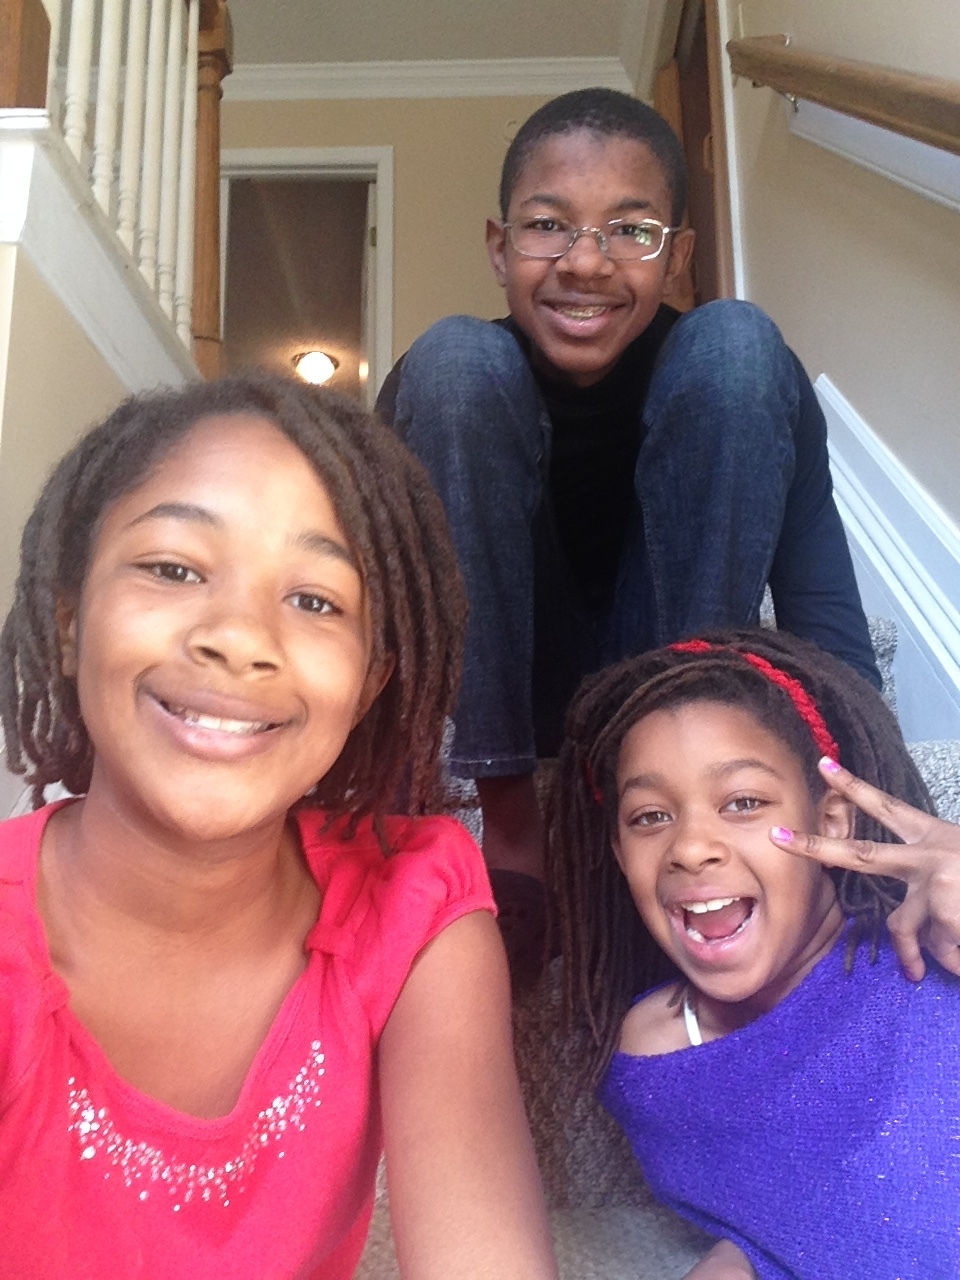 The Hall Children